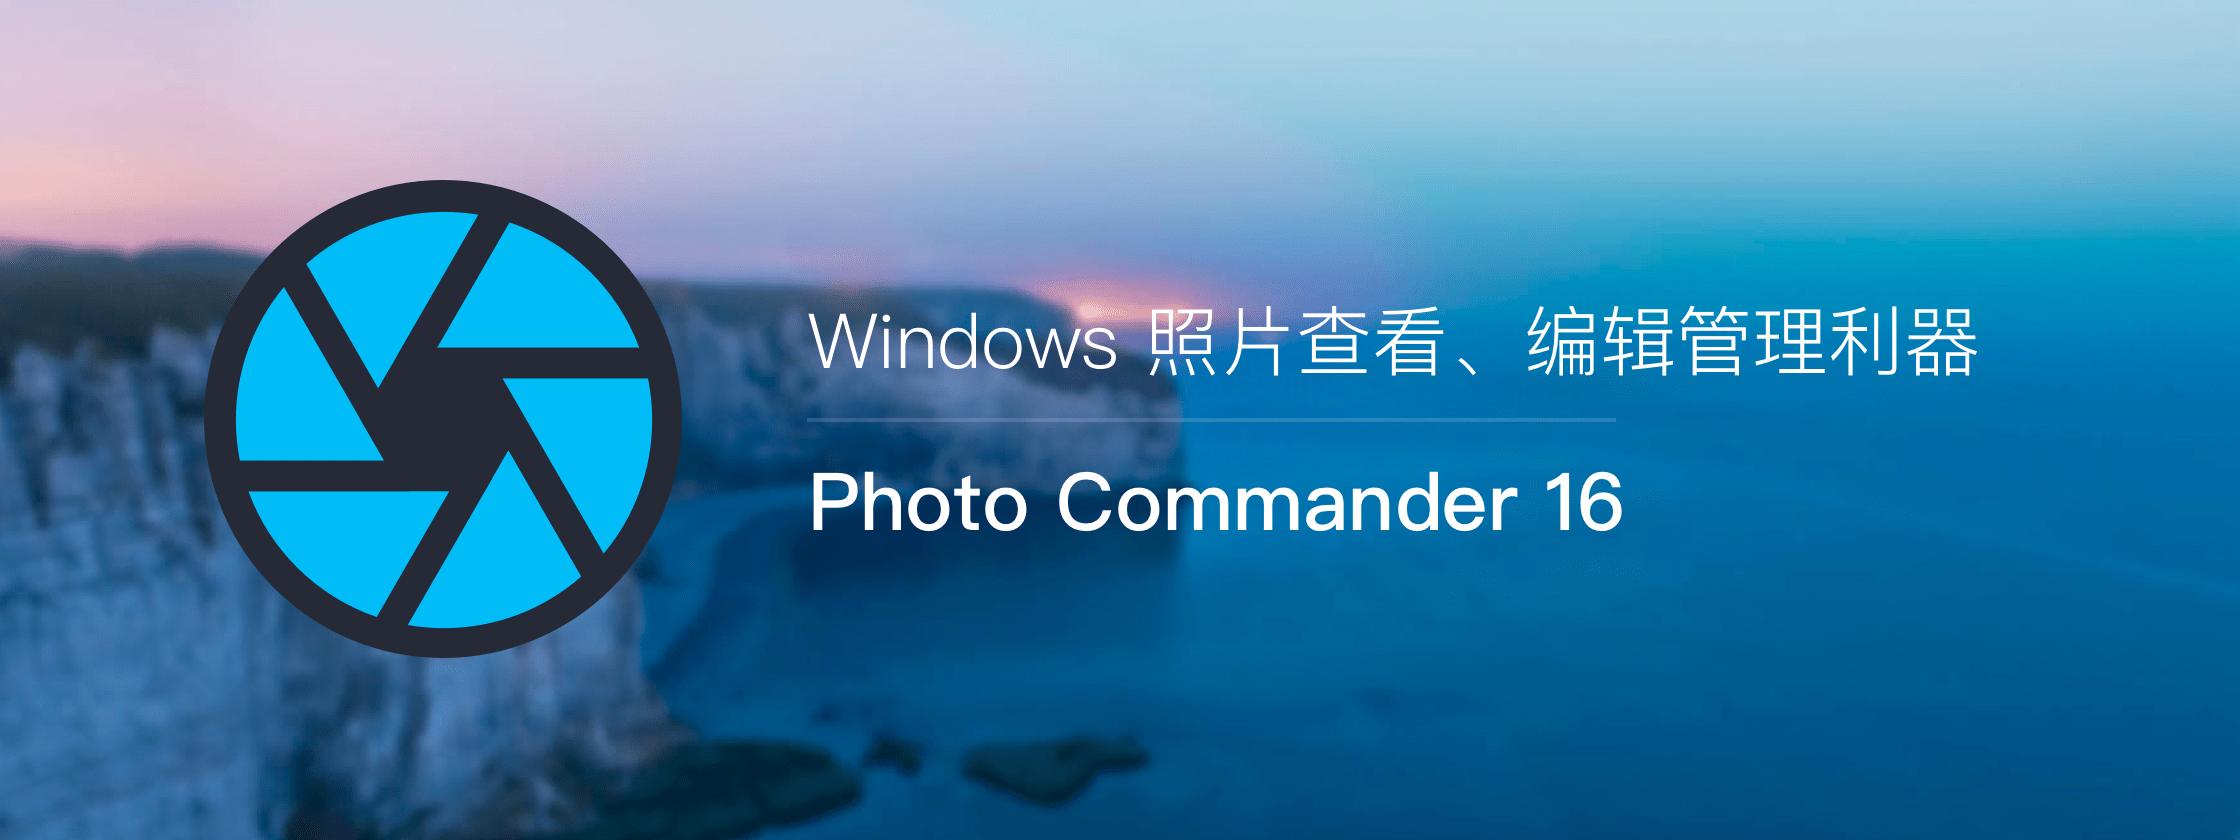 Photo Commander,Windows 照片查看编辑工具,你的全能照片管家